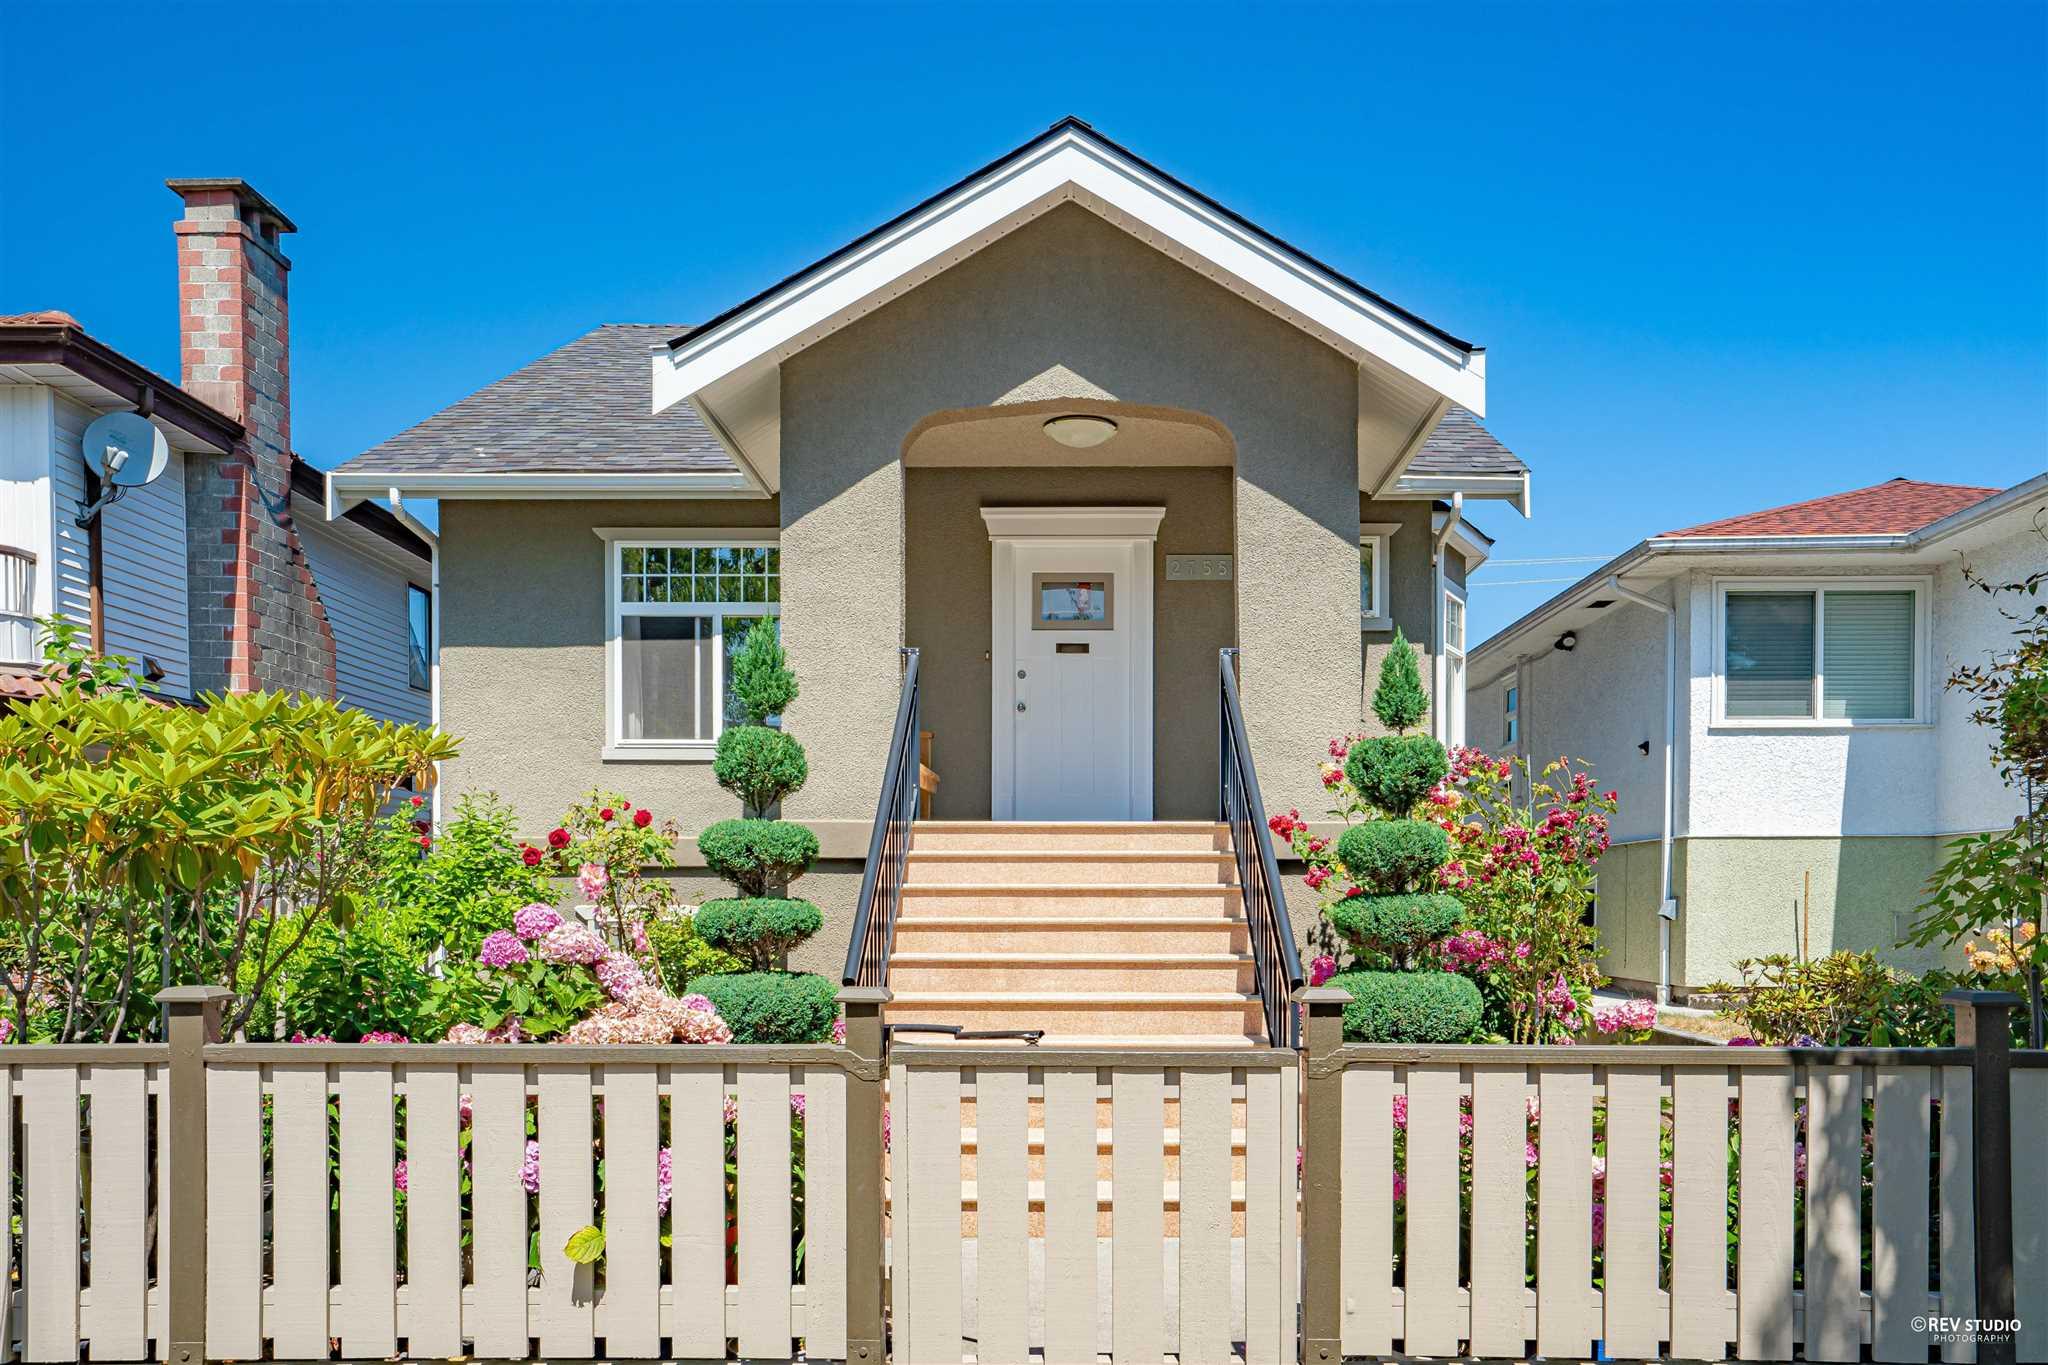 2755 E 2ND AVENUE - Renfrew VE House/Single Family for sale, 6 Bedrooms (R2606051) - #1